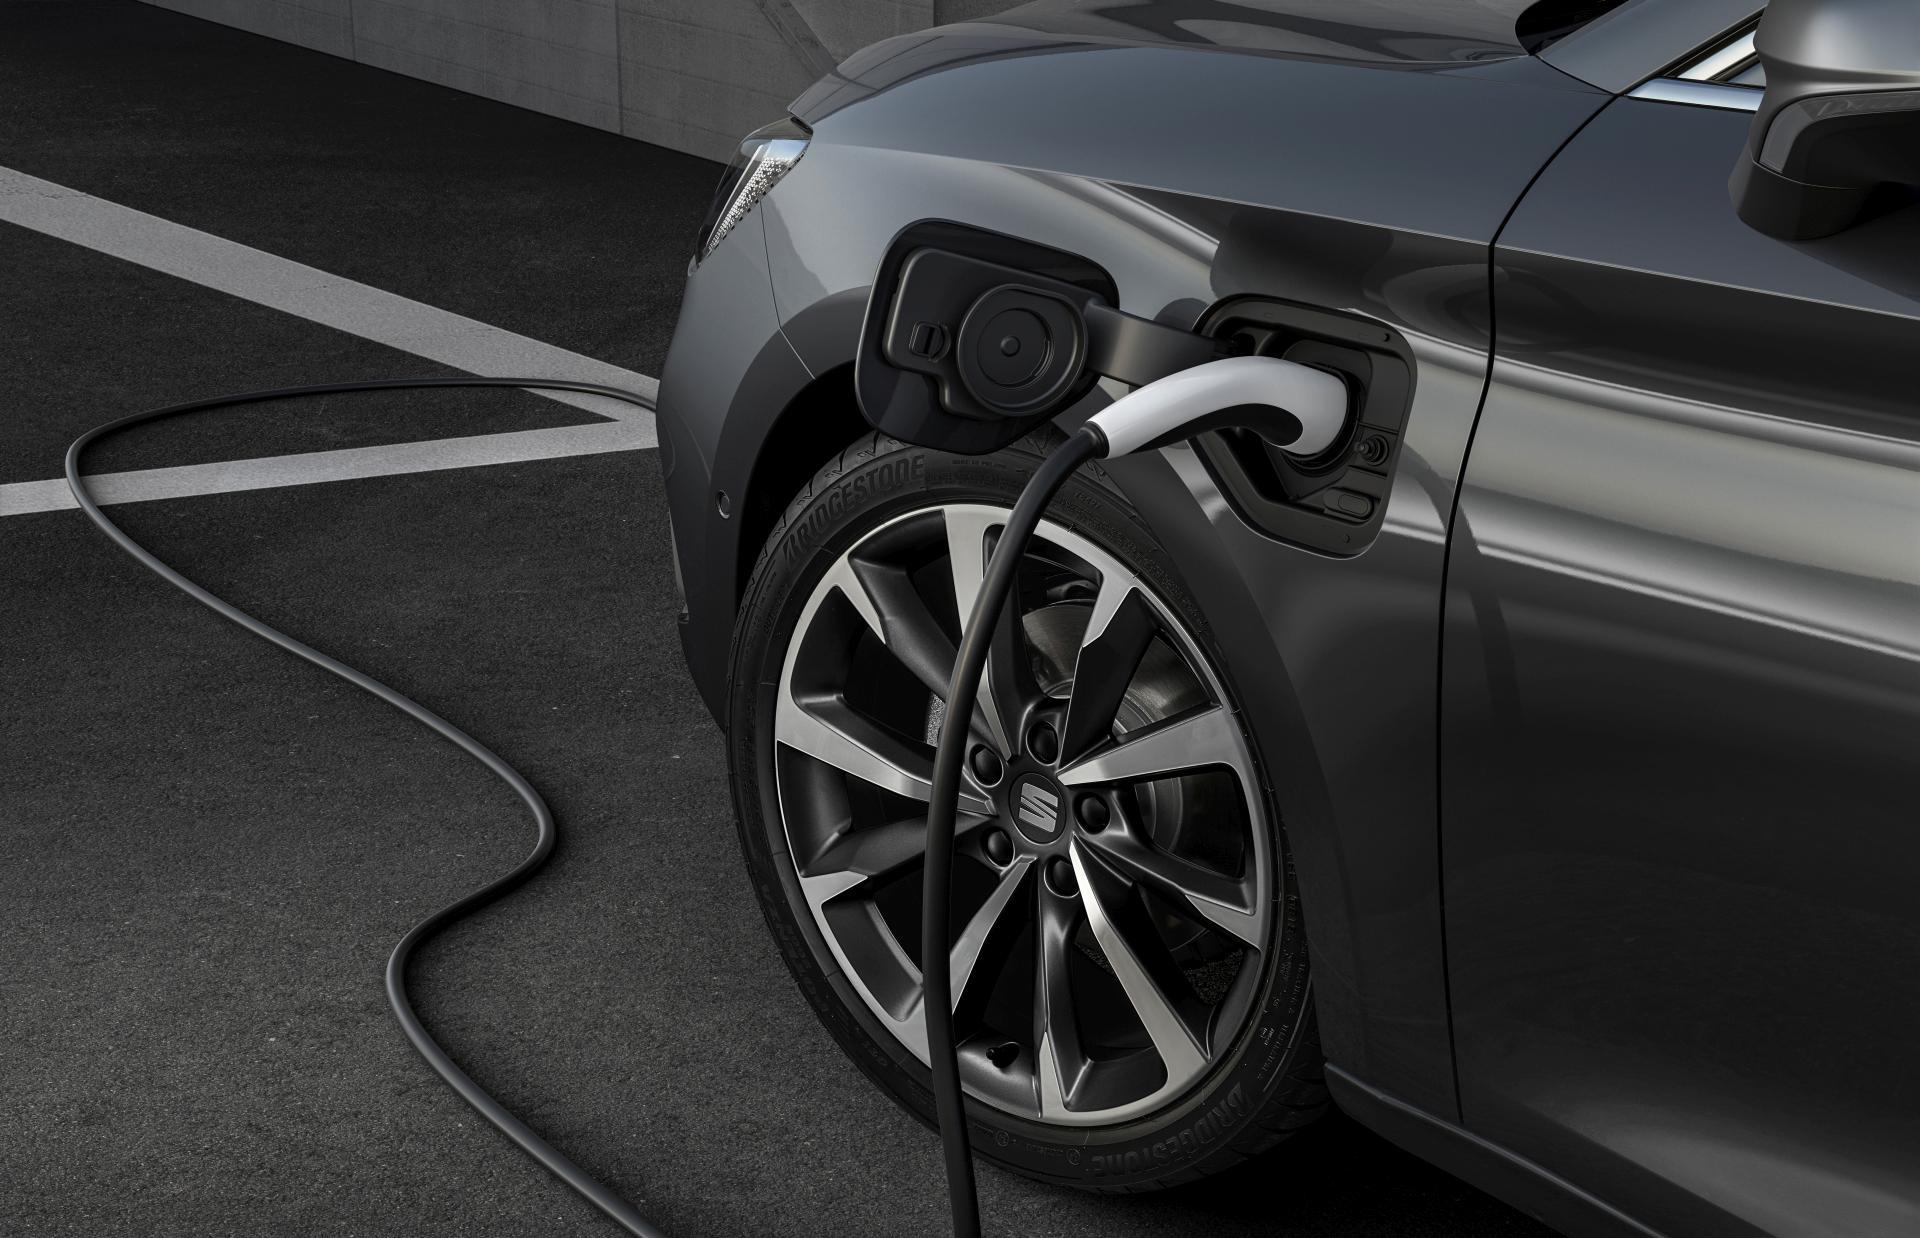 Seat Leon 2020 Plug-in Hybrid